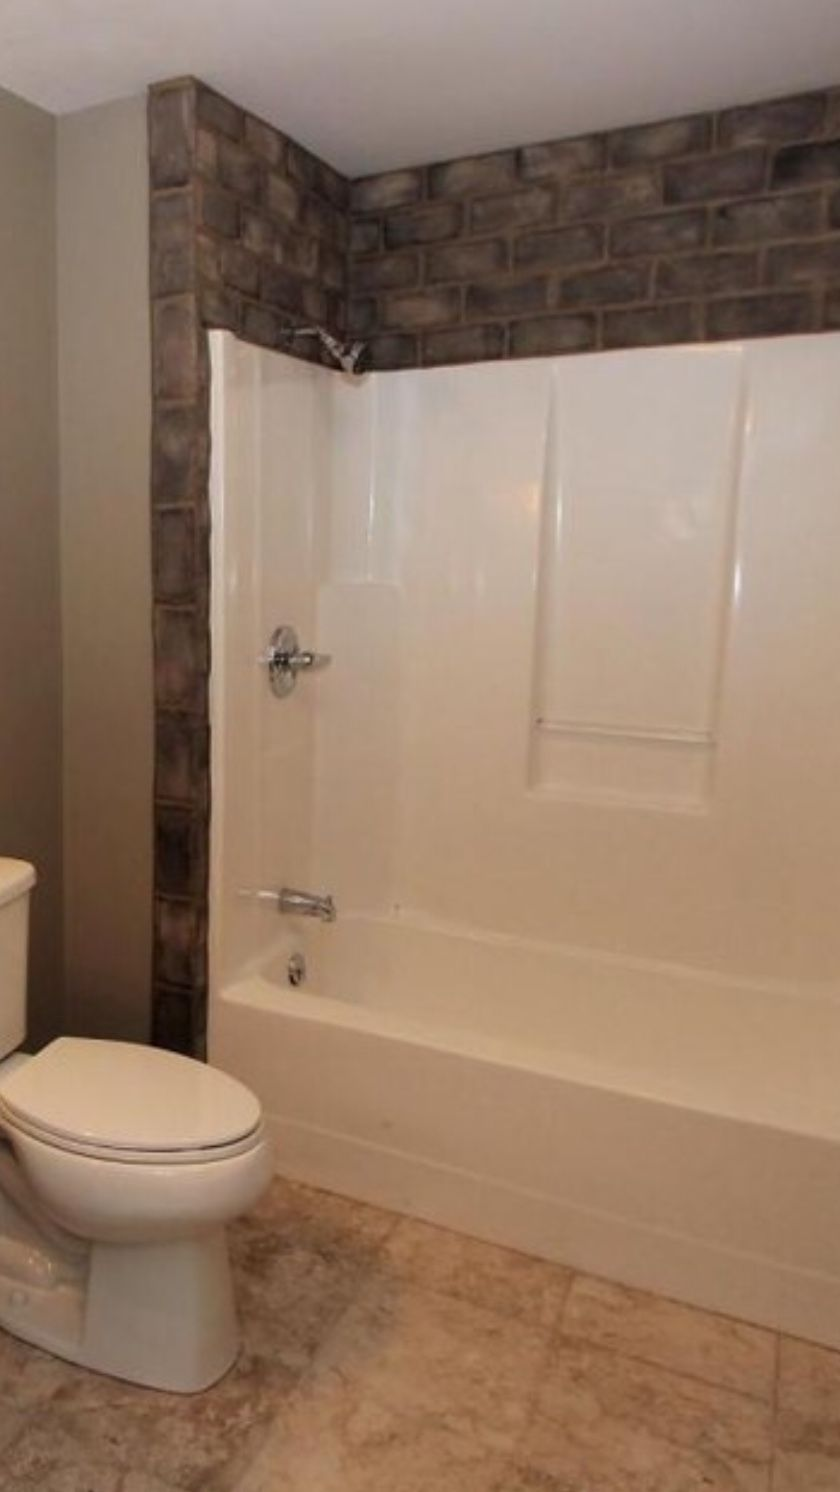 Tile Around Fiberglass Tub Surround Bathtub Walls